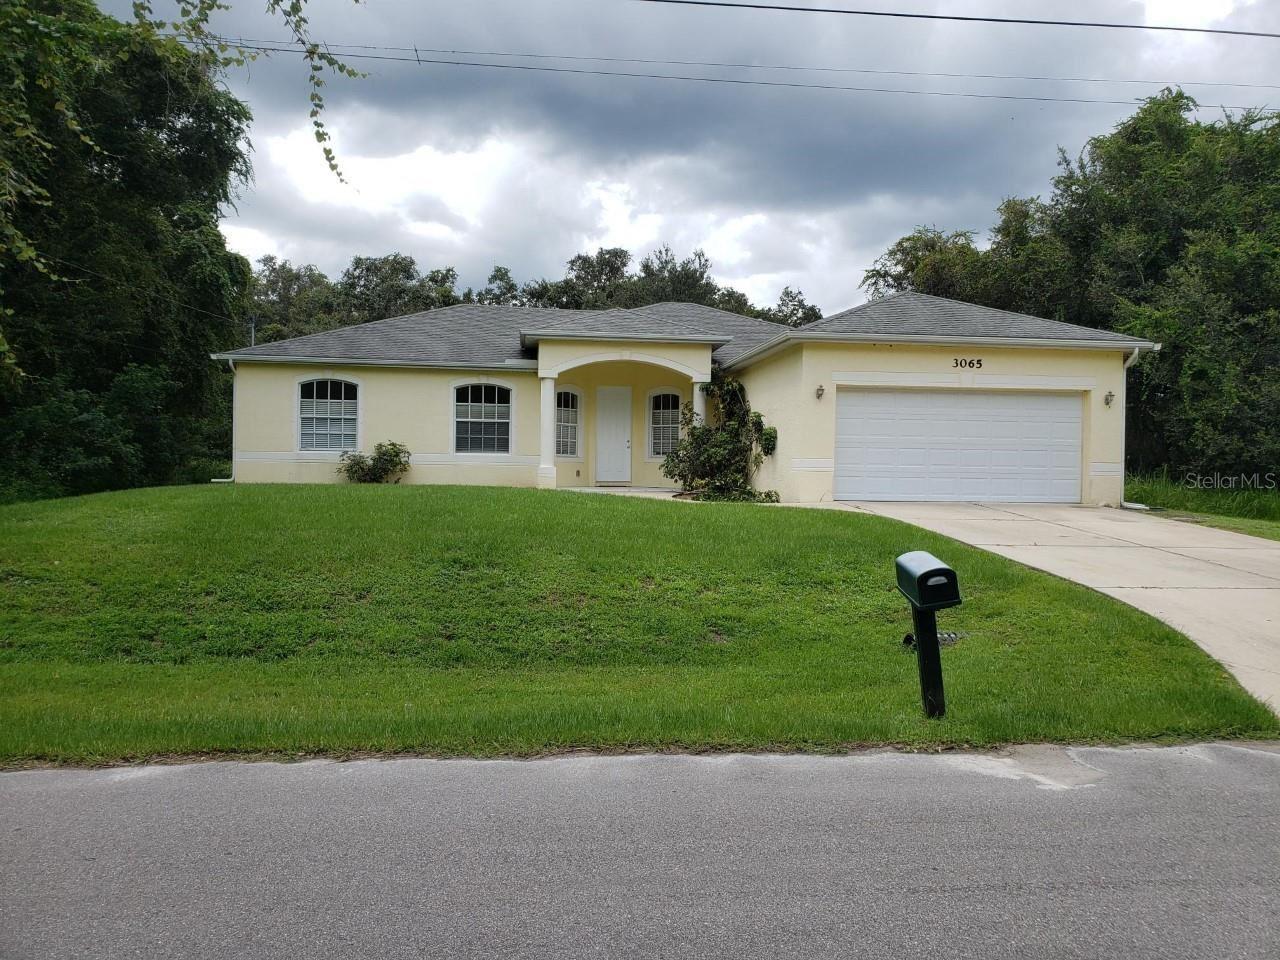 3065 TOWN TERRACE, North Port, FL 34286 - #: N6117718